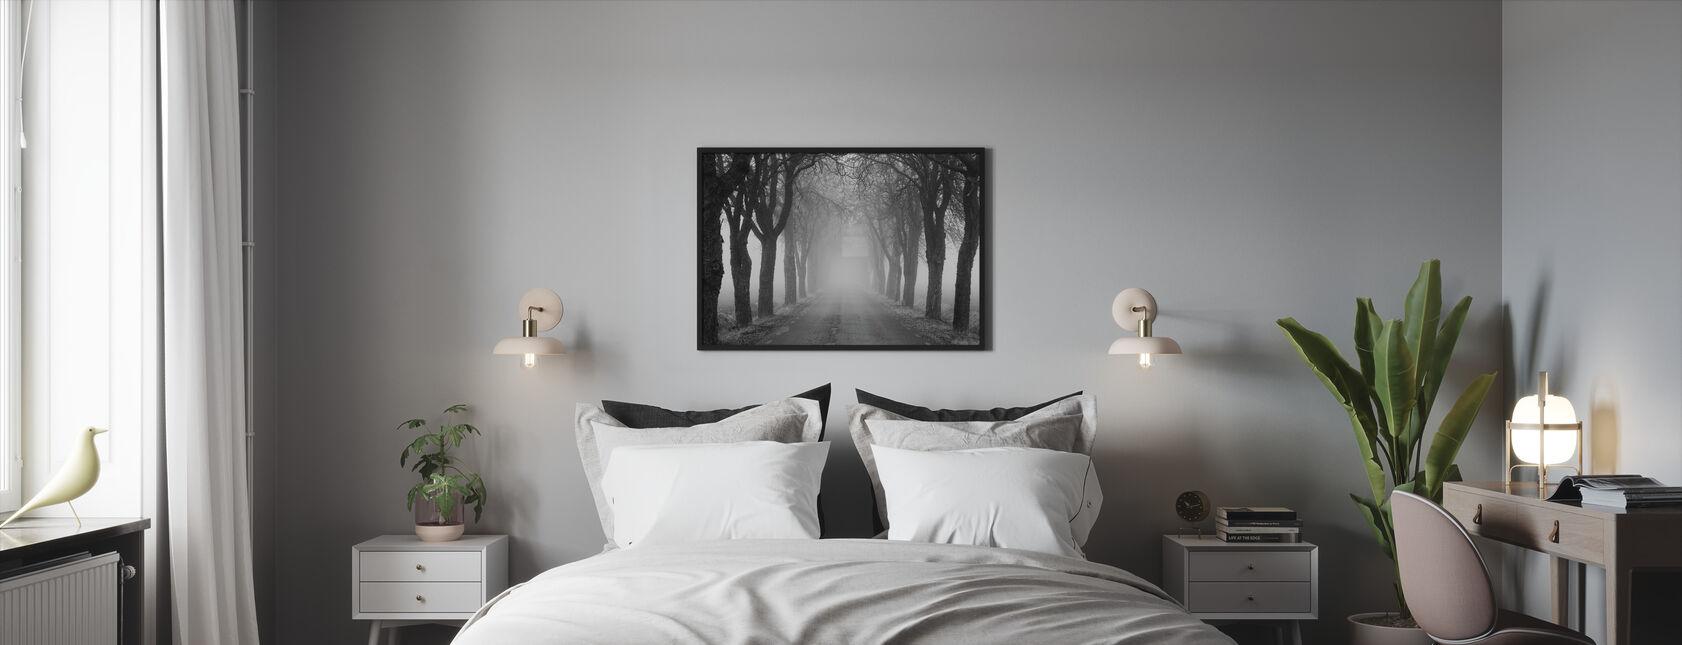 Avenue - Kehystetty kuva - Makuuhuone